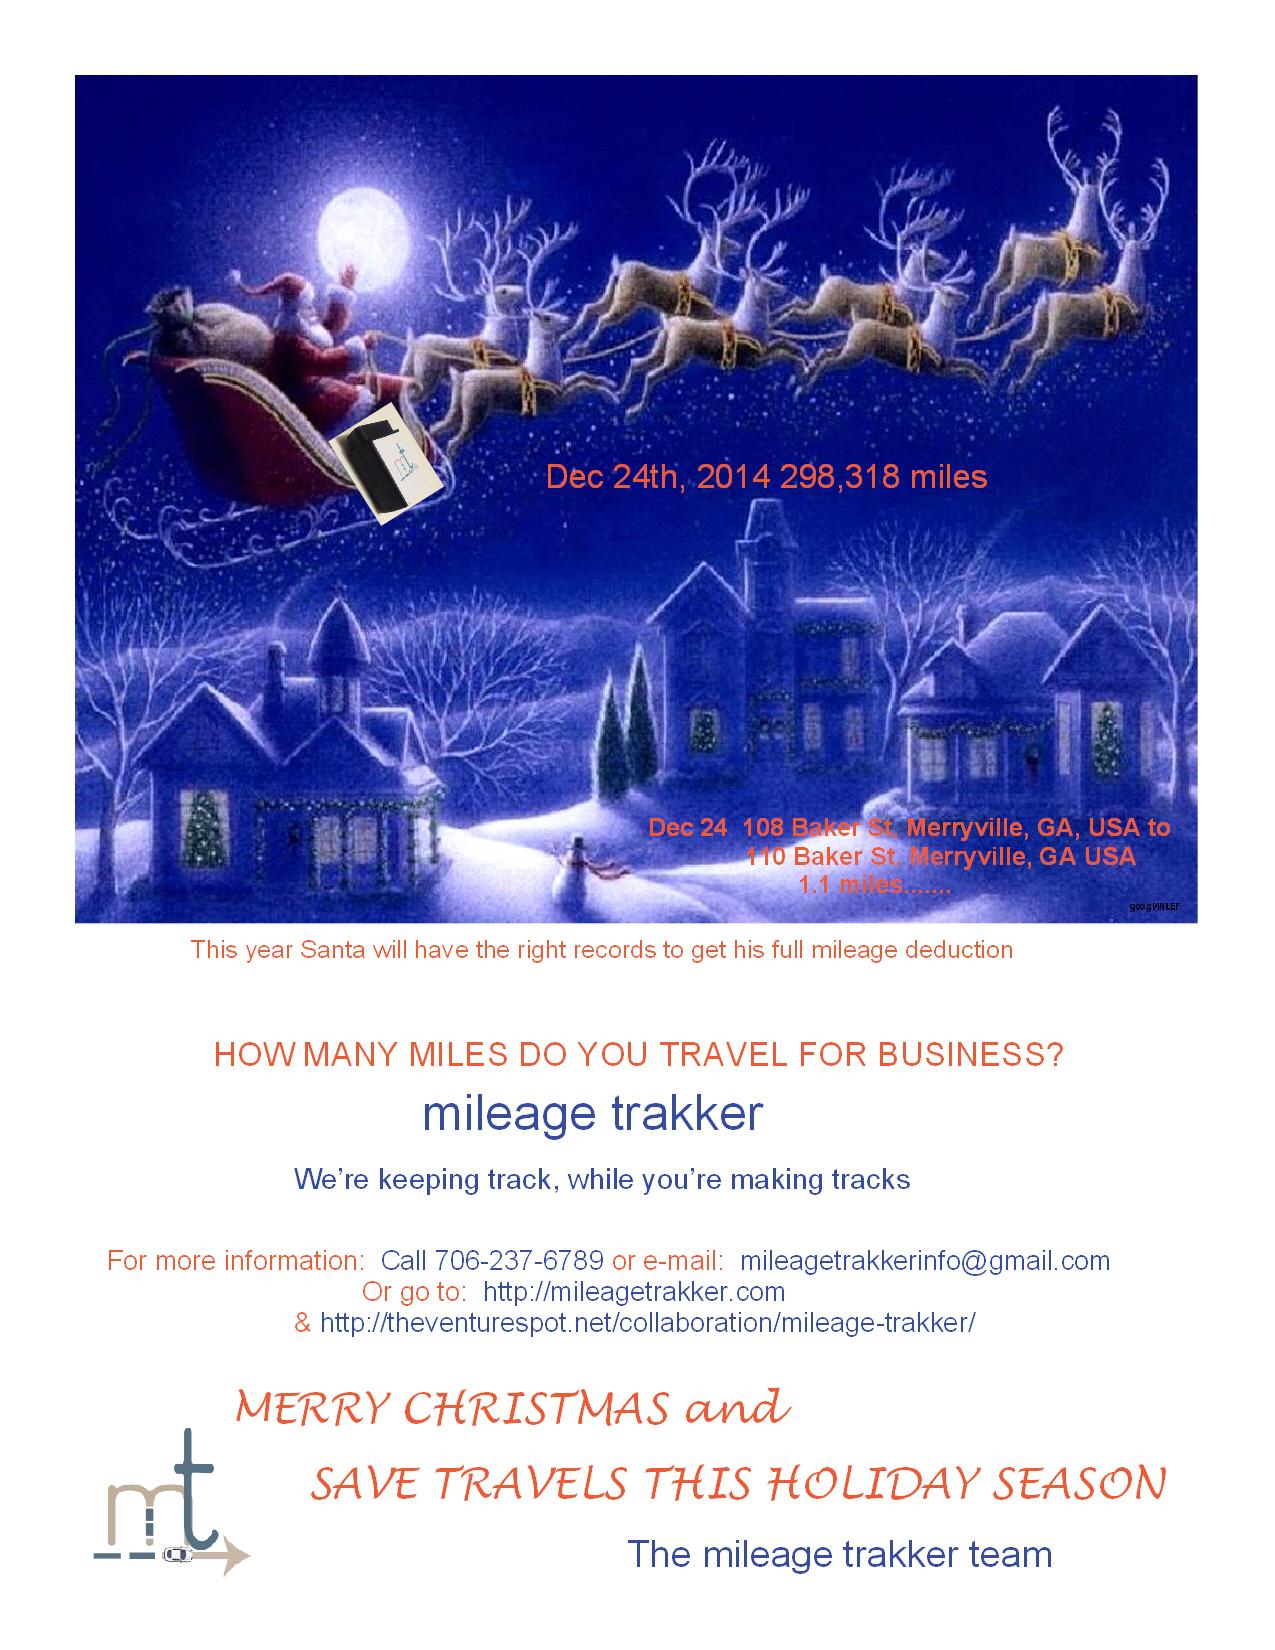 2014 Mileage Trakker Christmas Message